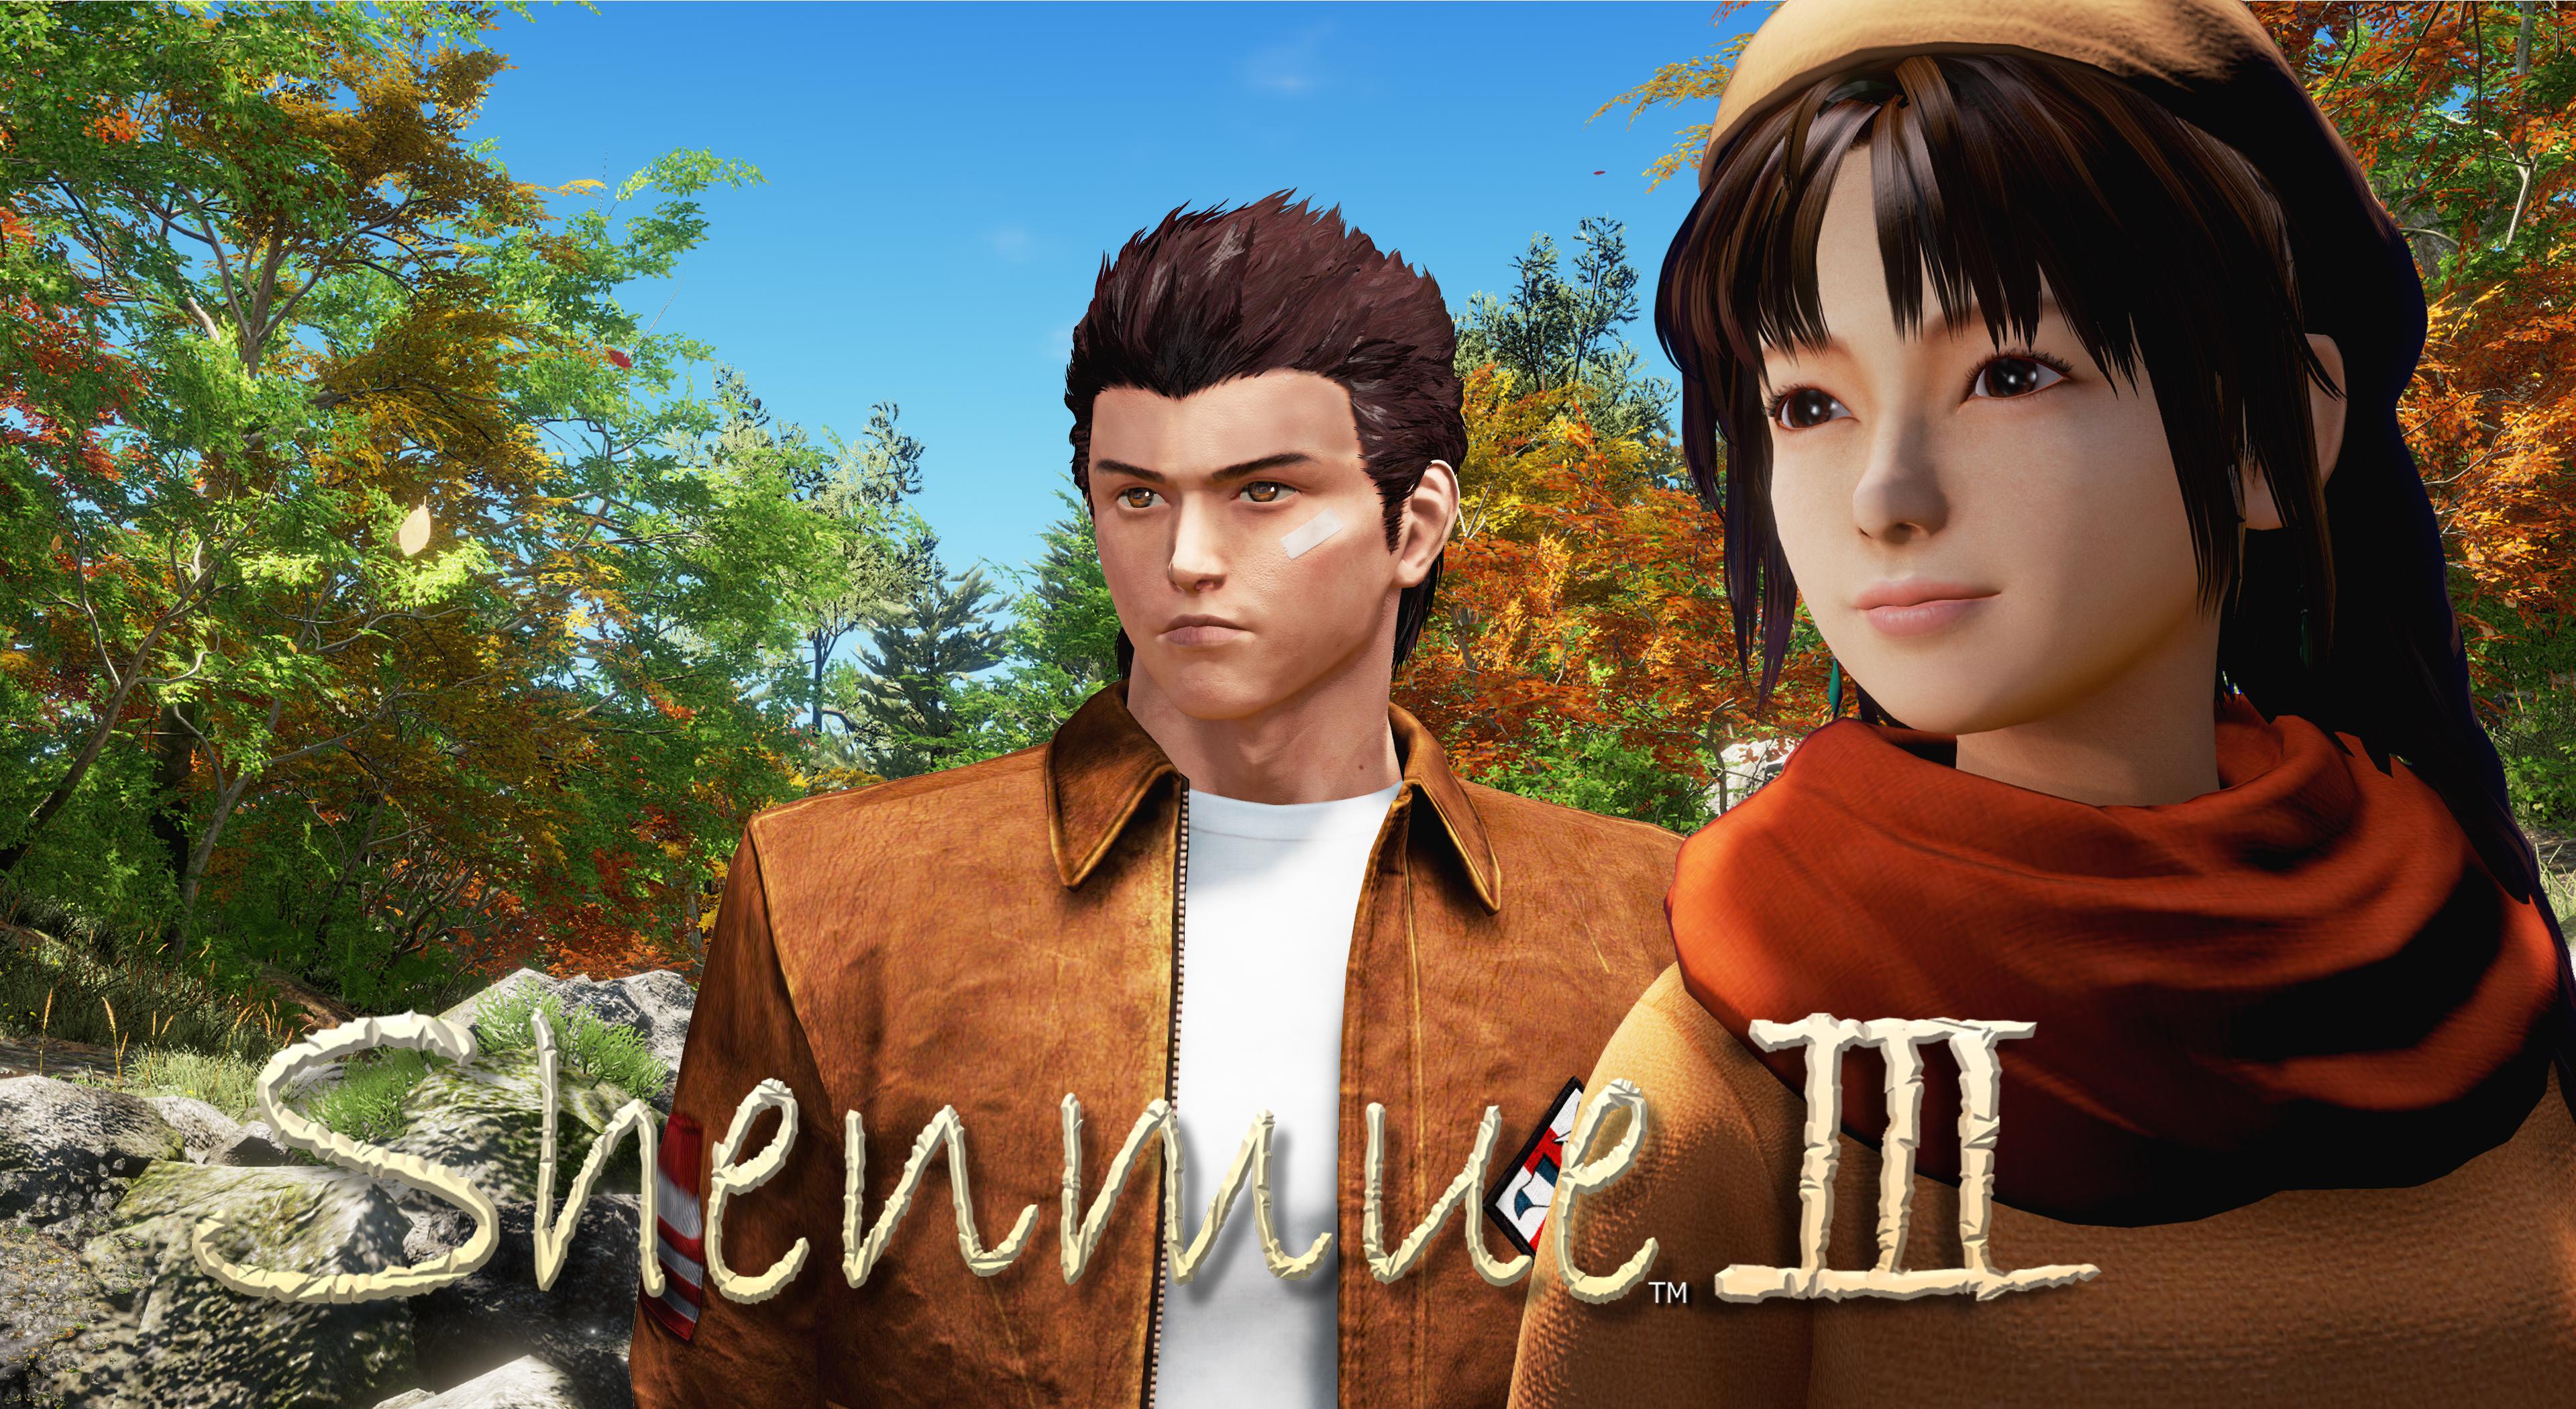 Shenmue III Shenmue 3